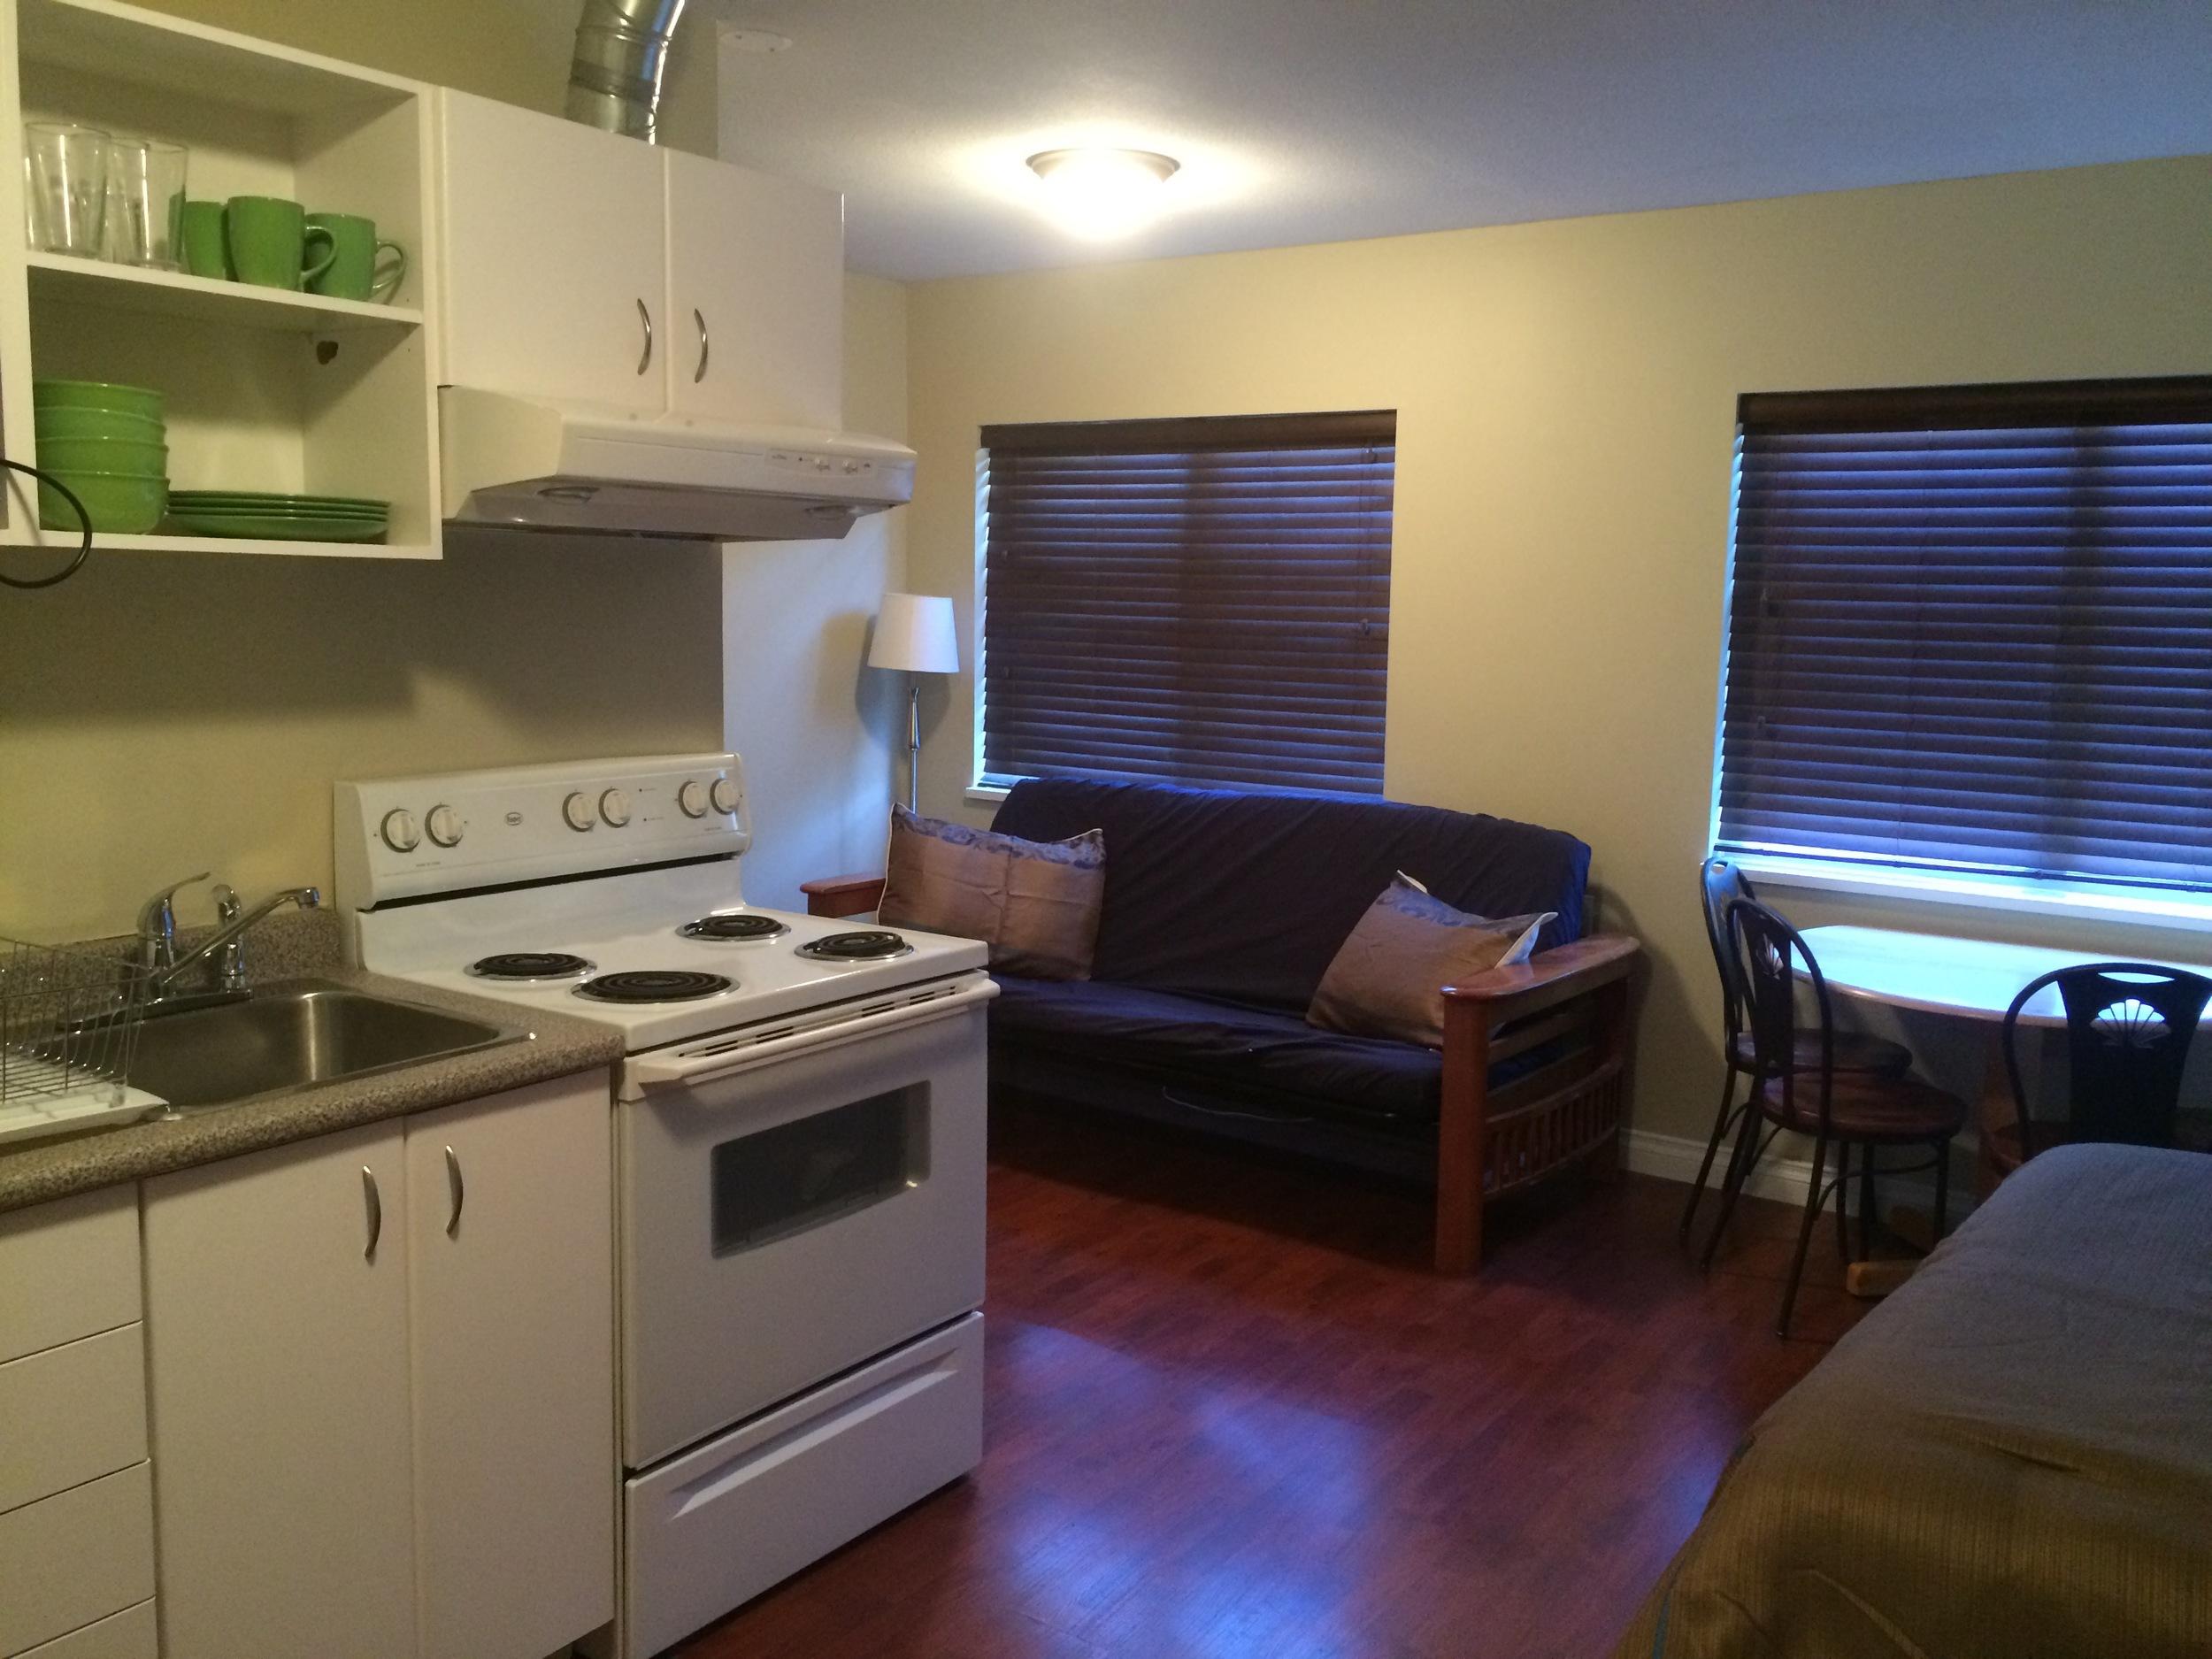 kitchenette suite facing windows.JPG